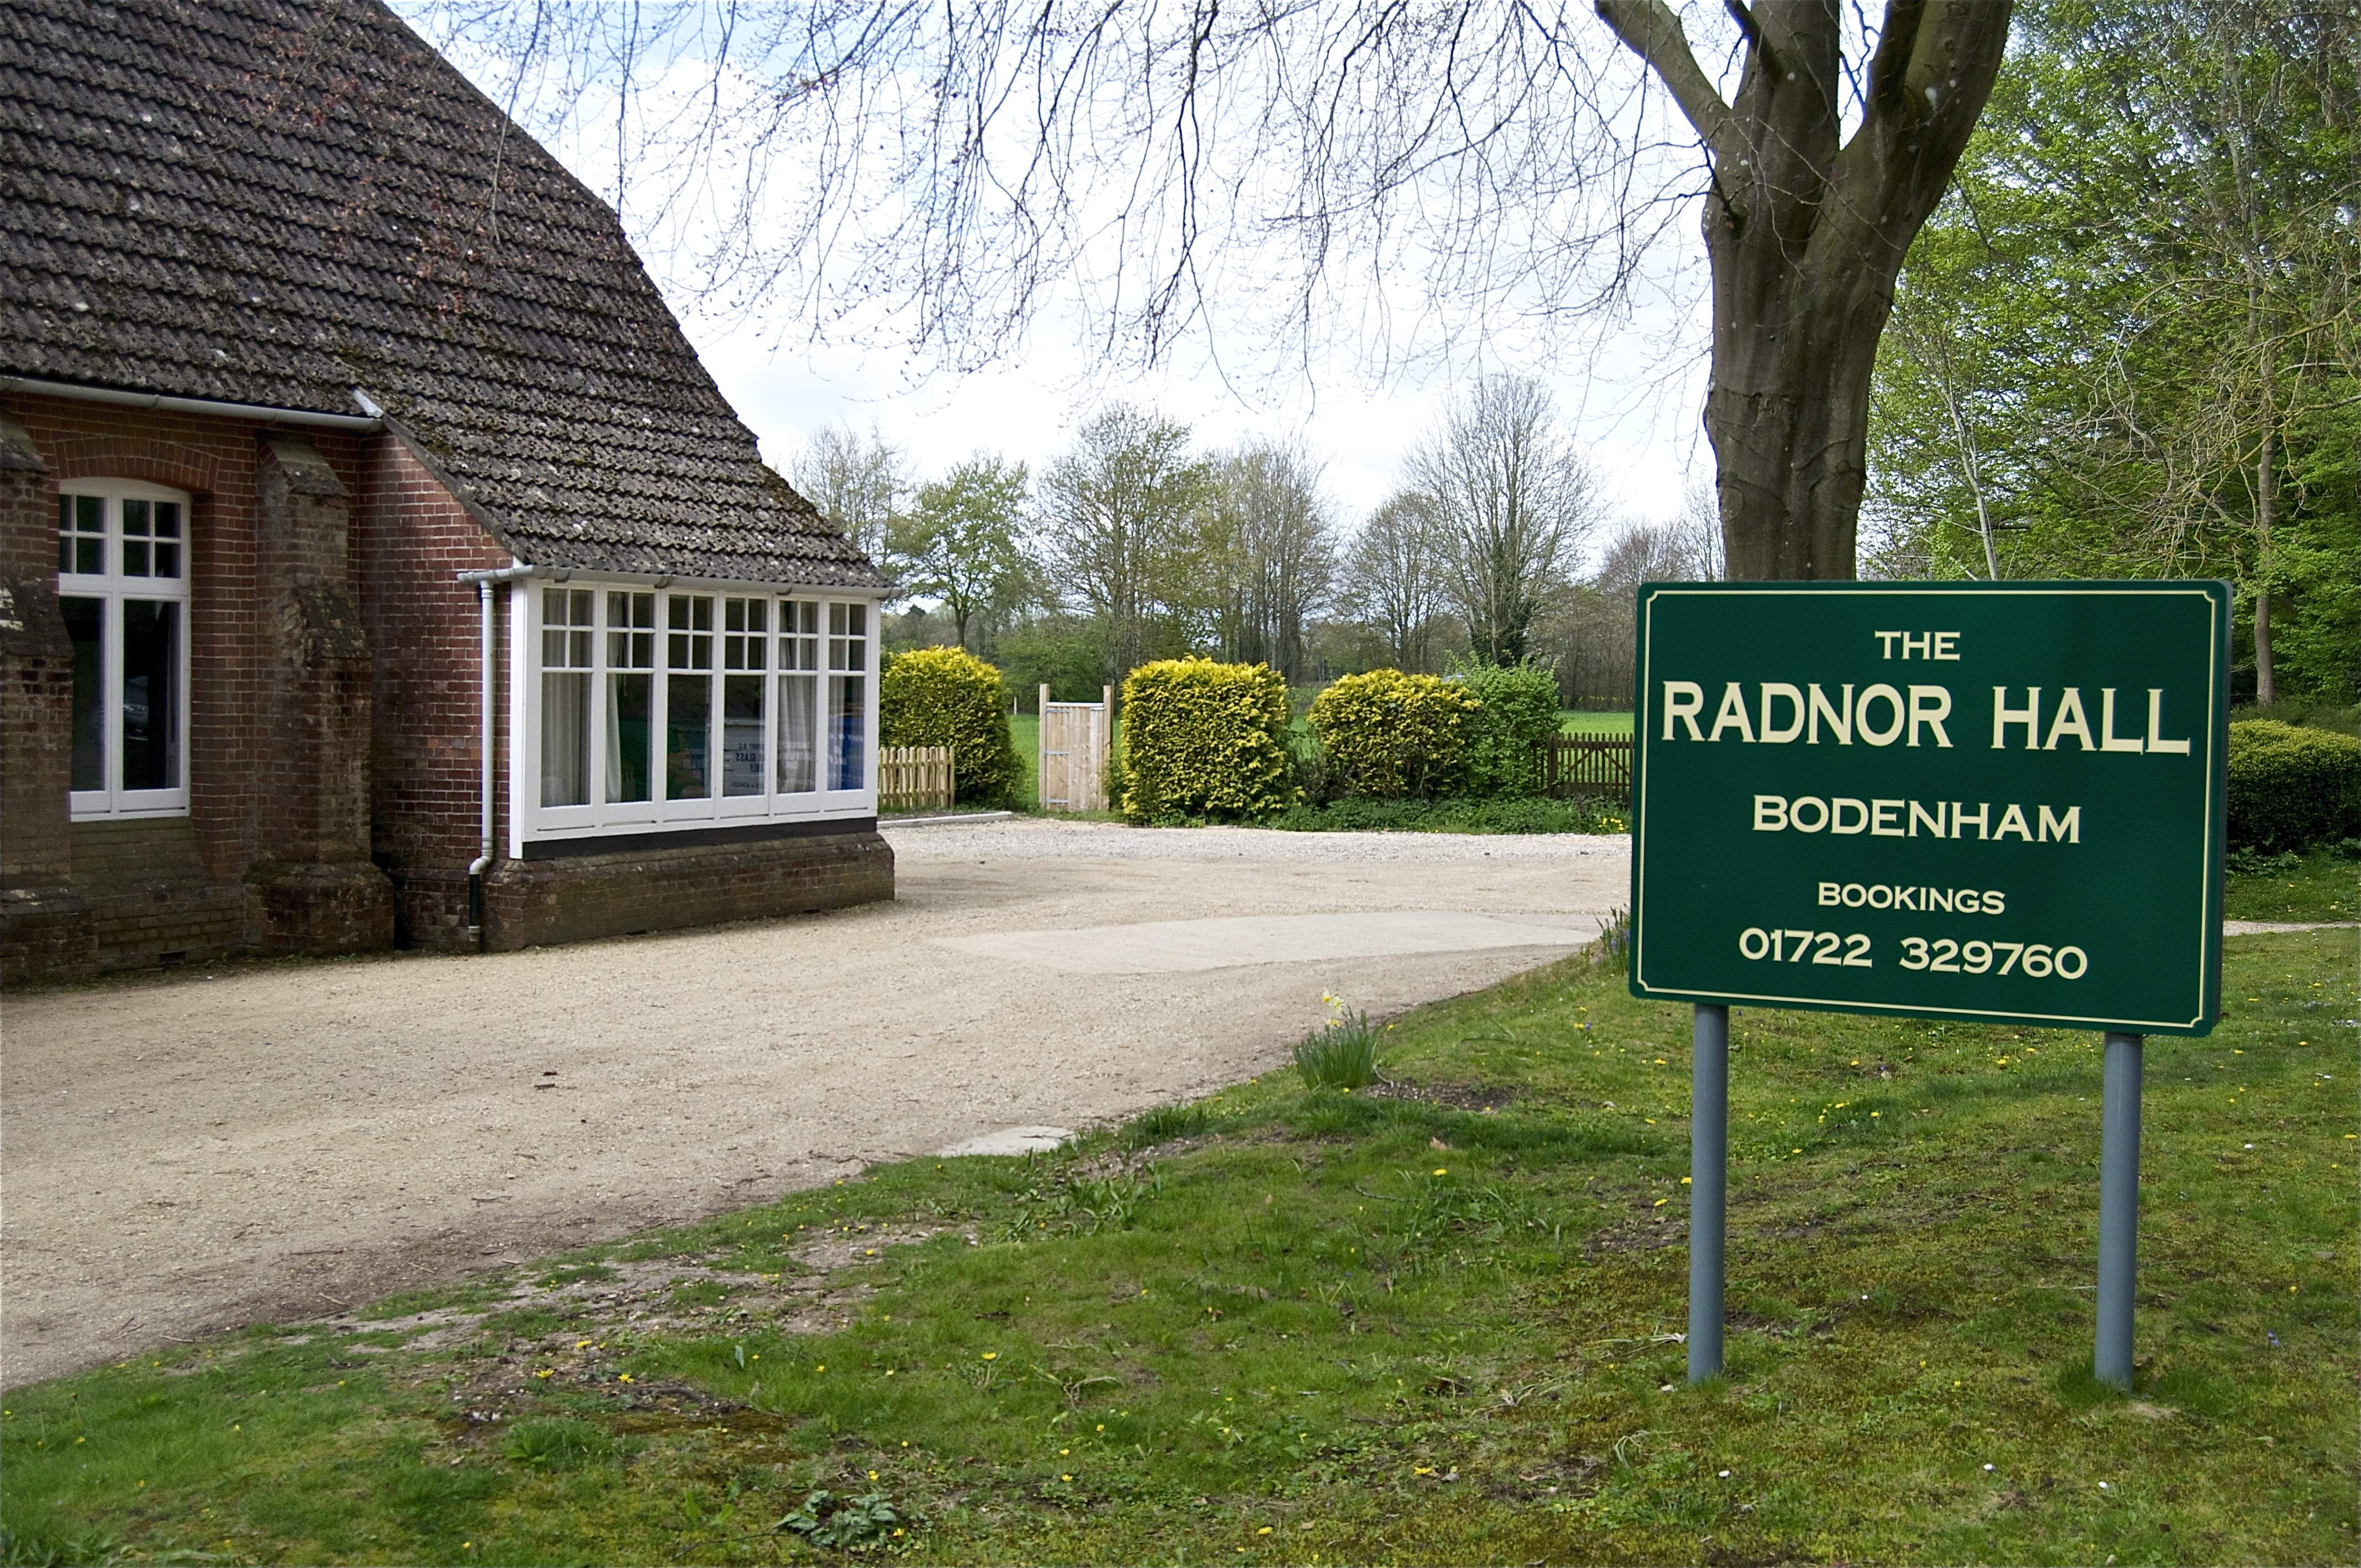 Radnor Hall Bodenham Salisbury